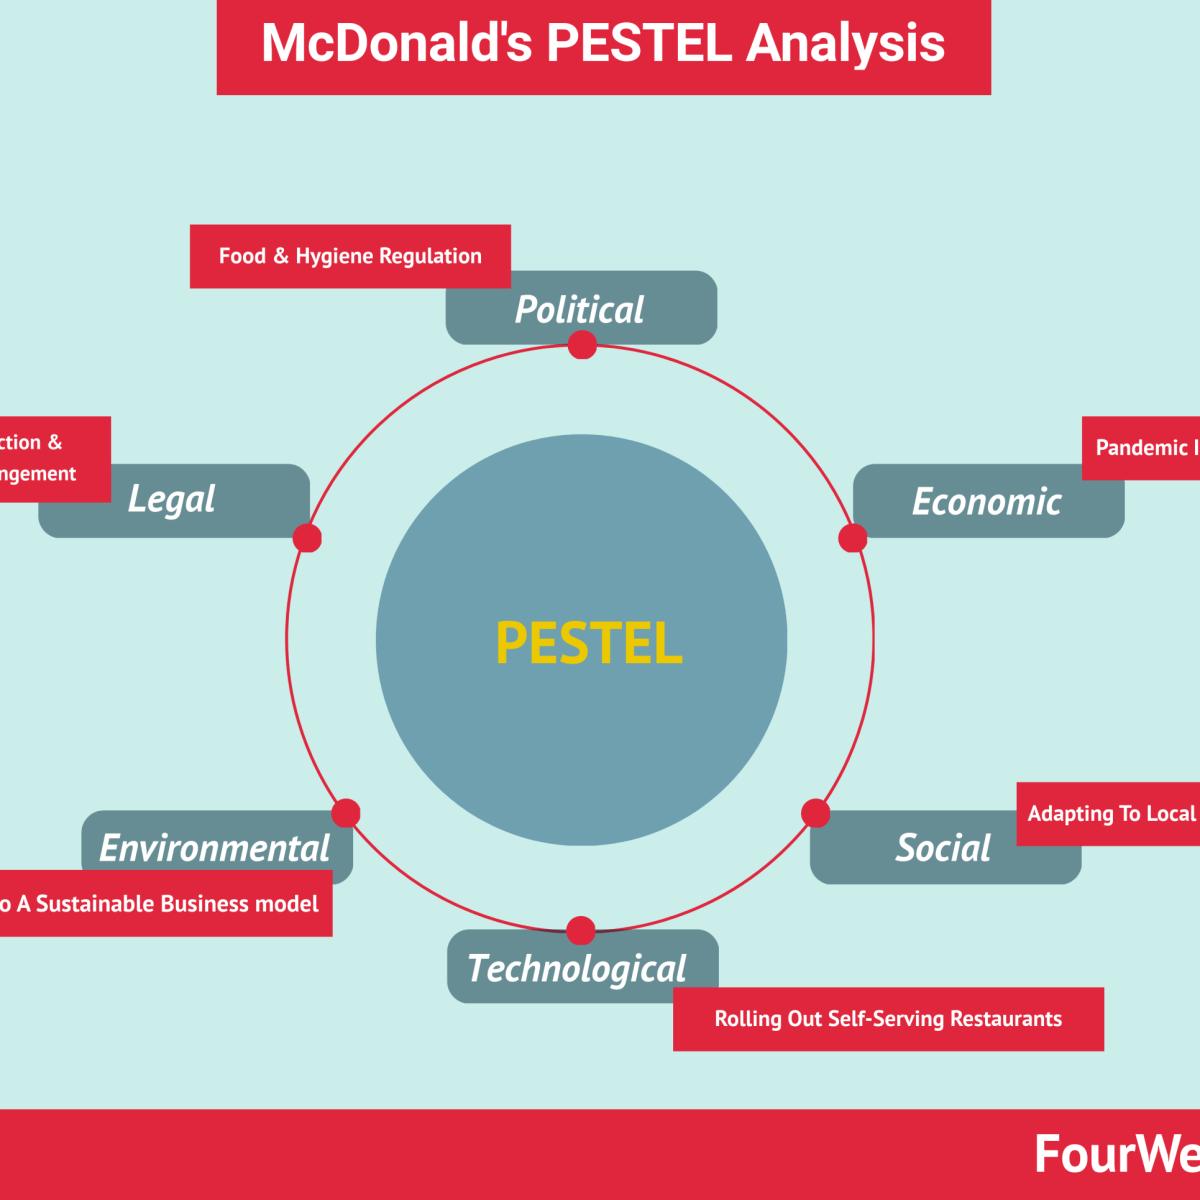 McDonald's PESTEL Analysis